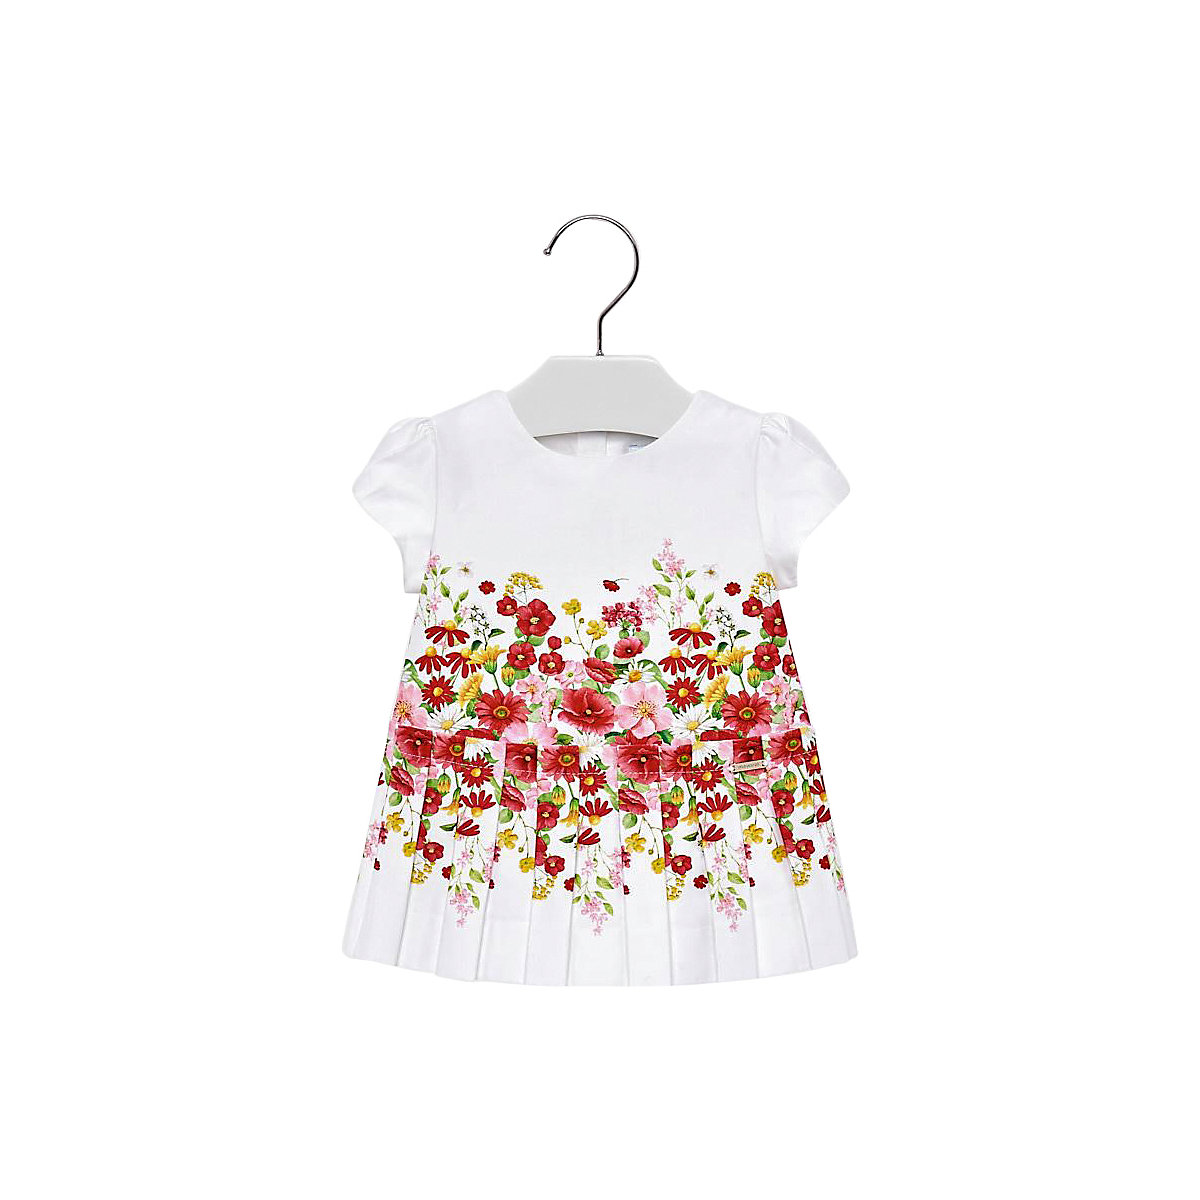 MAYORAL Dresses 10678522 dress for girls baby clothing fashion slim family long sleeve mesh dress for girls